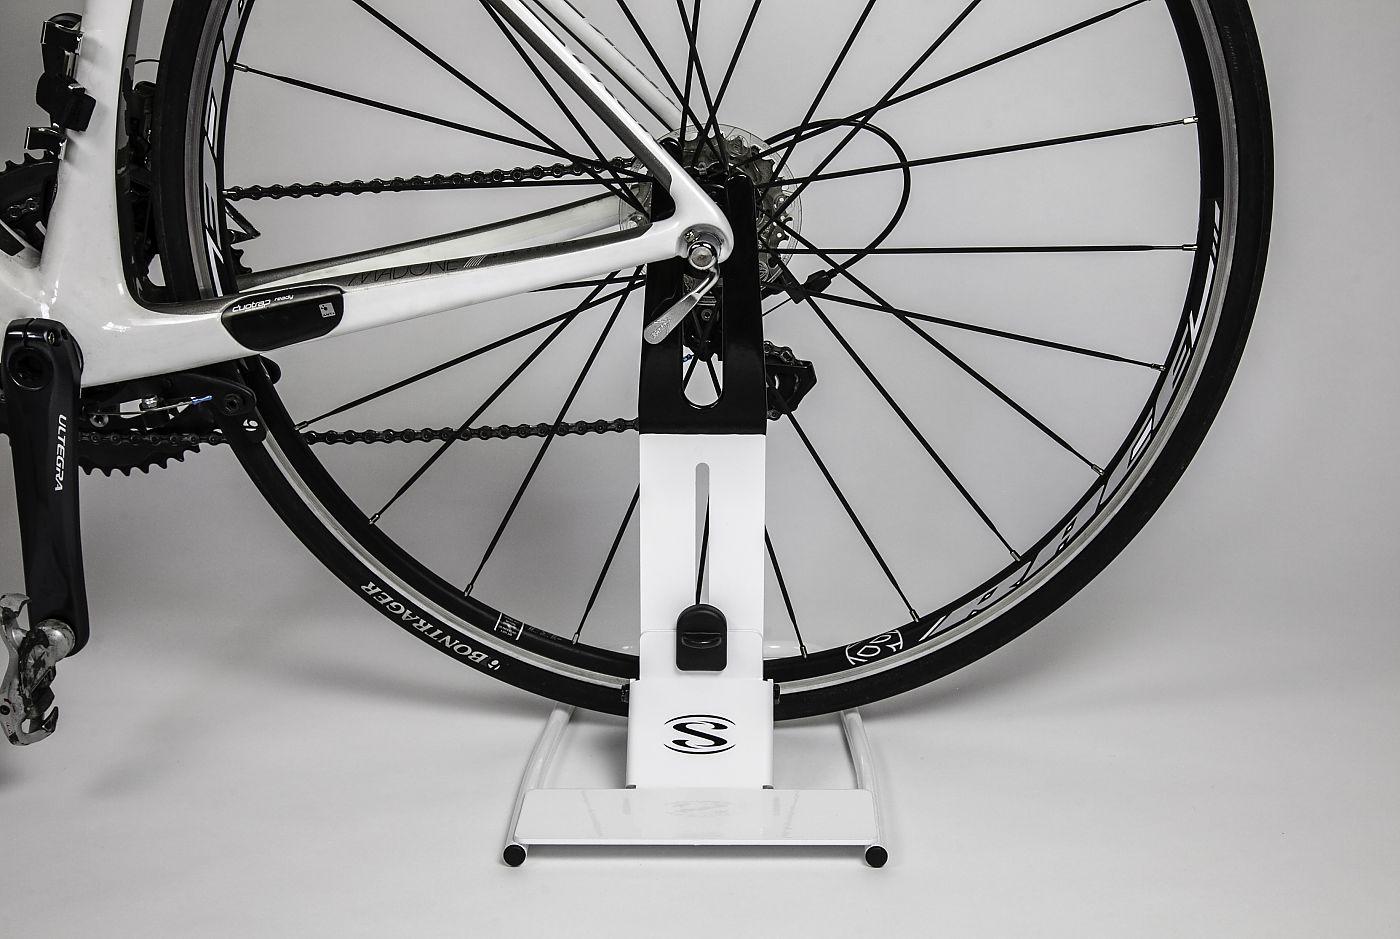 Saris Introduces Home Bike Storage Line Interbike Displays Bicycle Retailer And